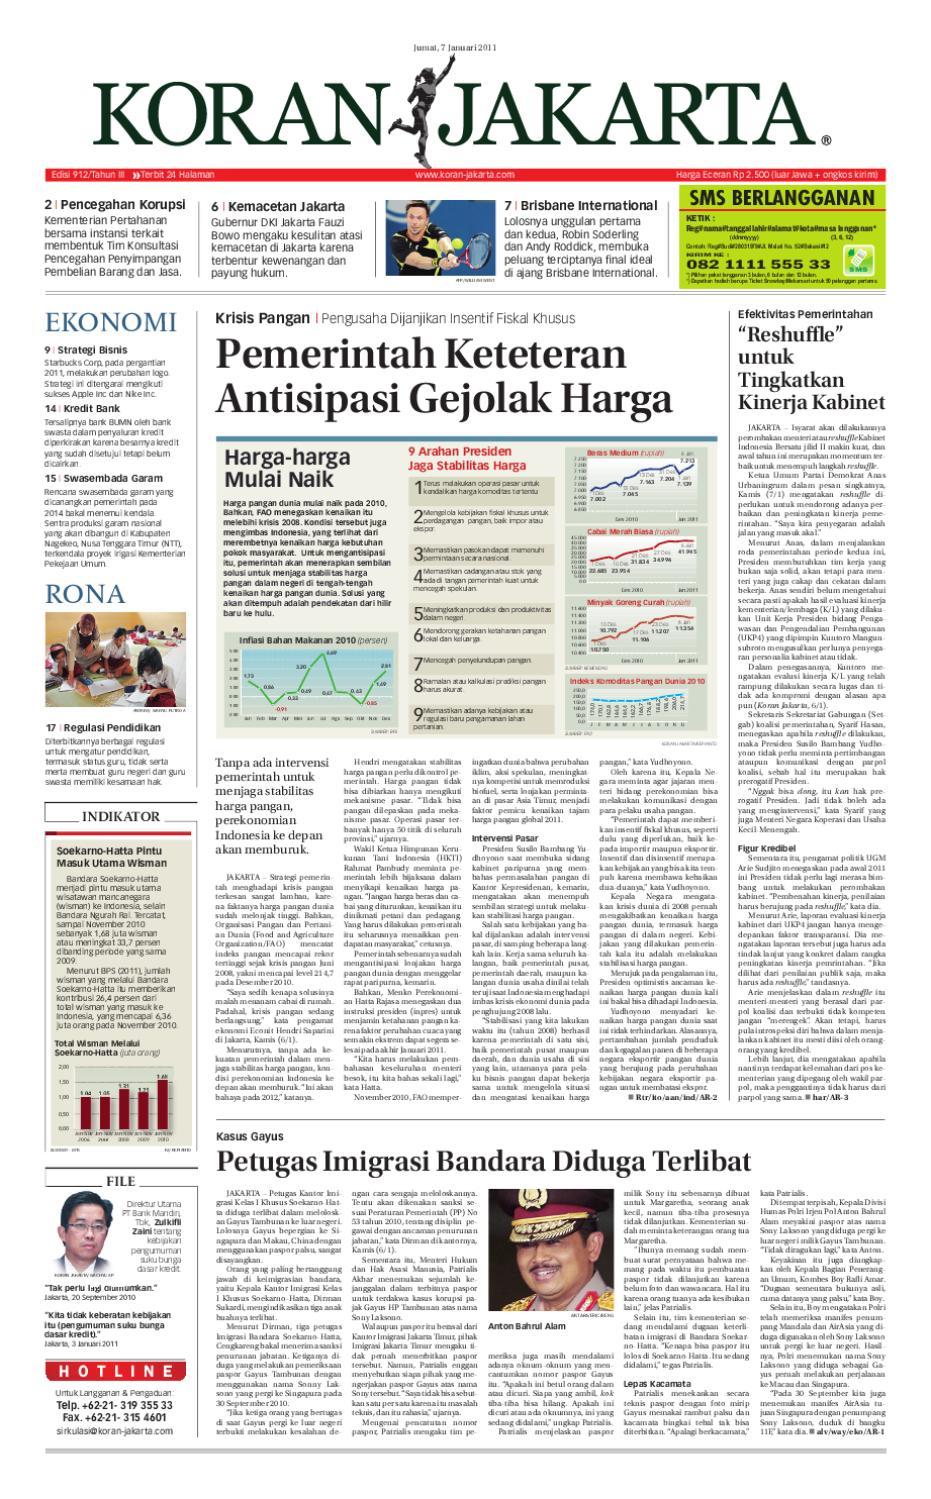 EDISI 912 7 JANUARI 2011 By PT Berita Nusantara Issuu